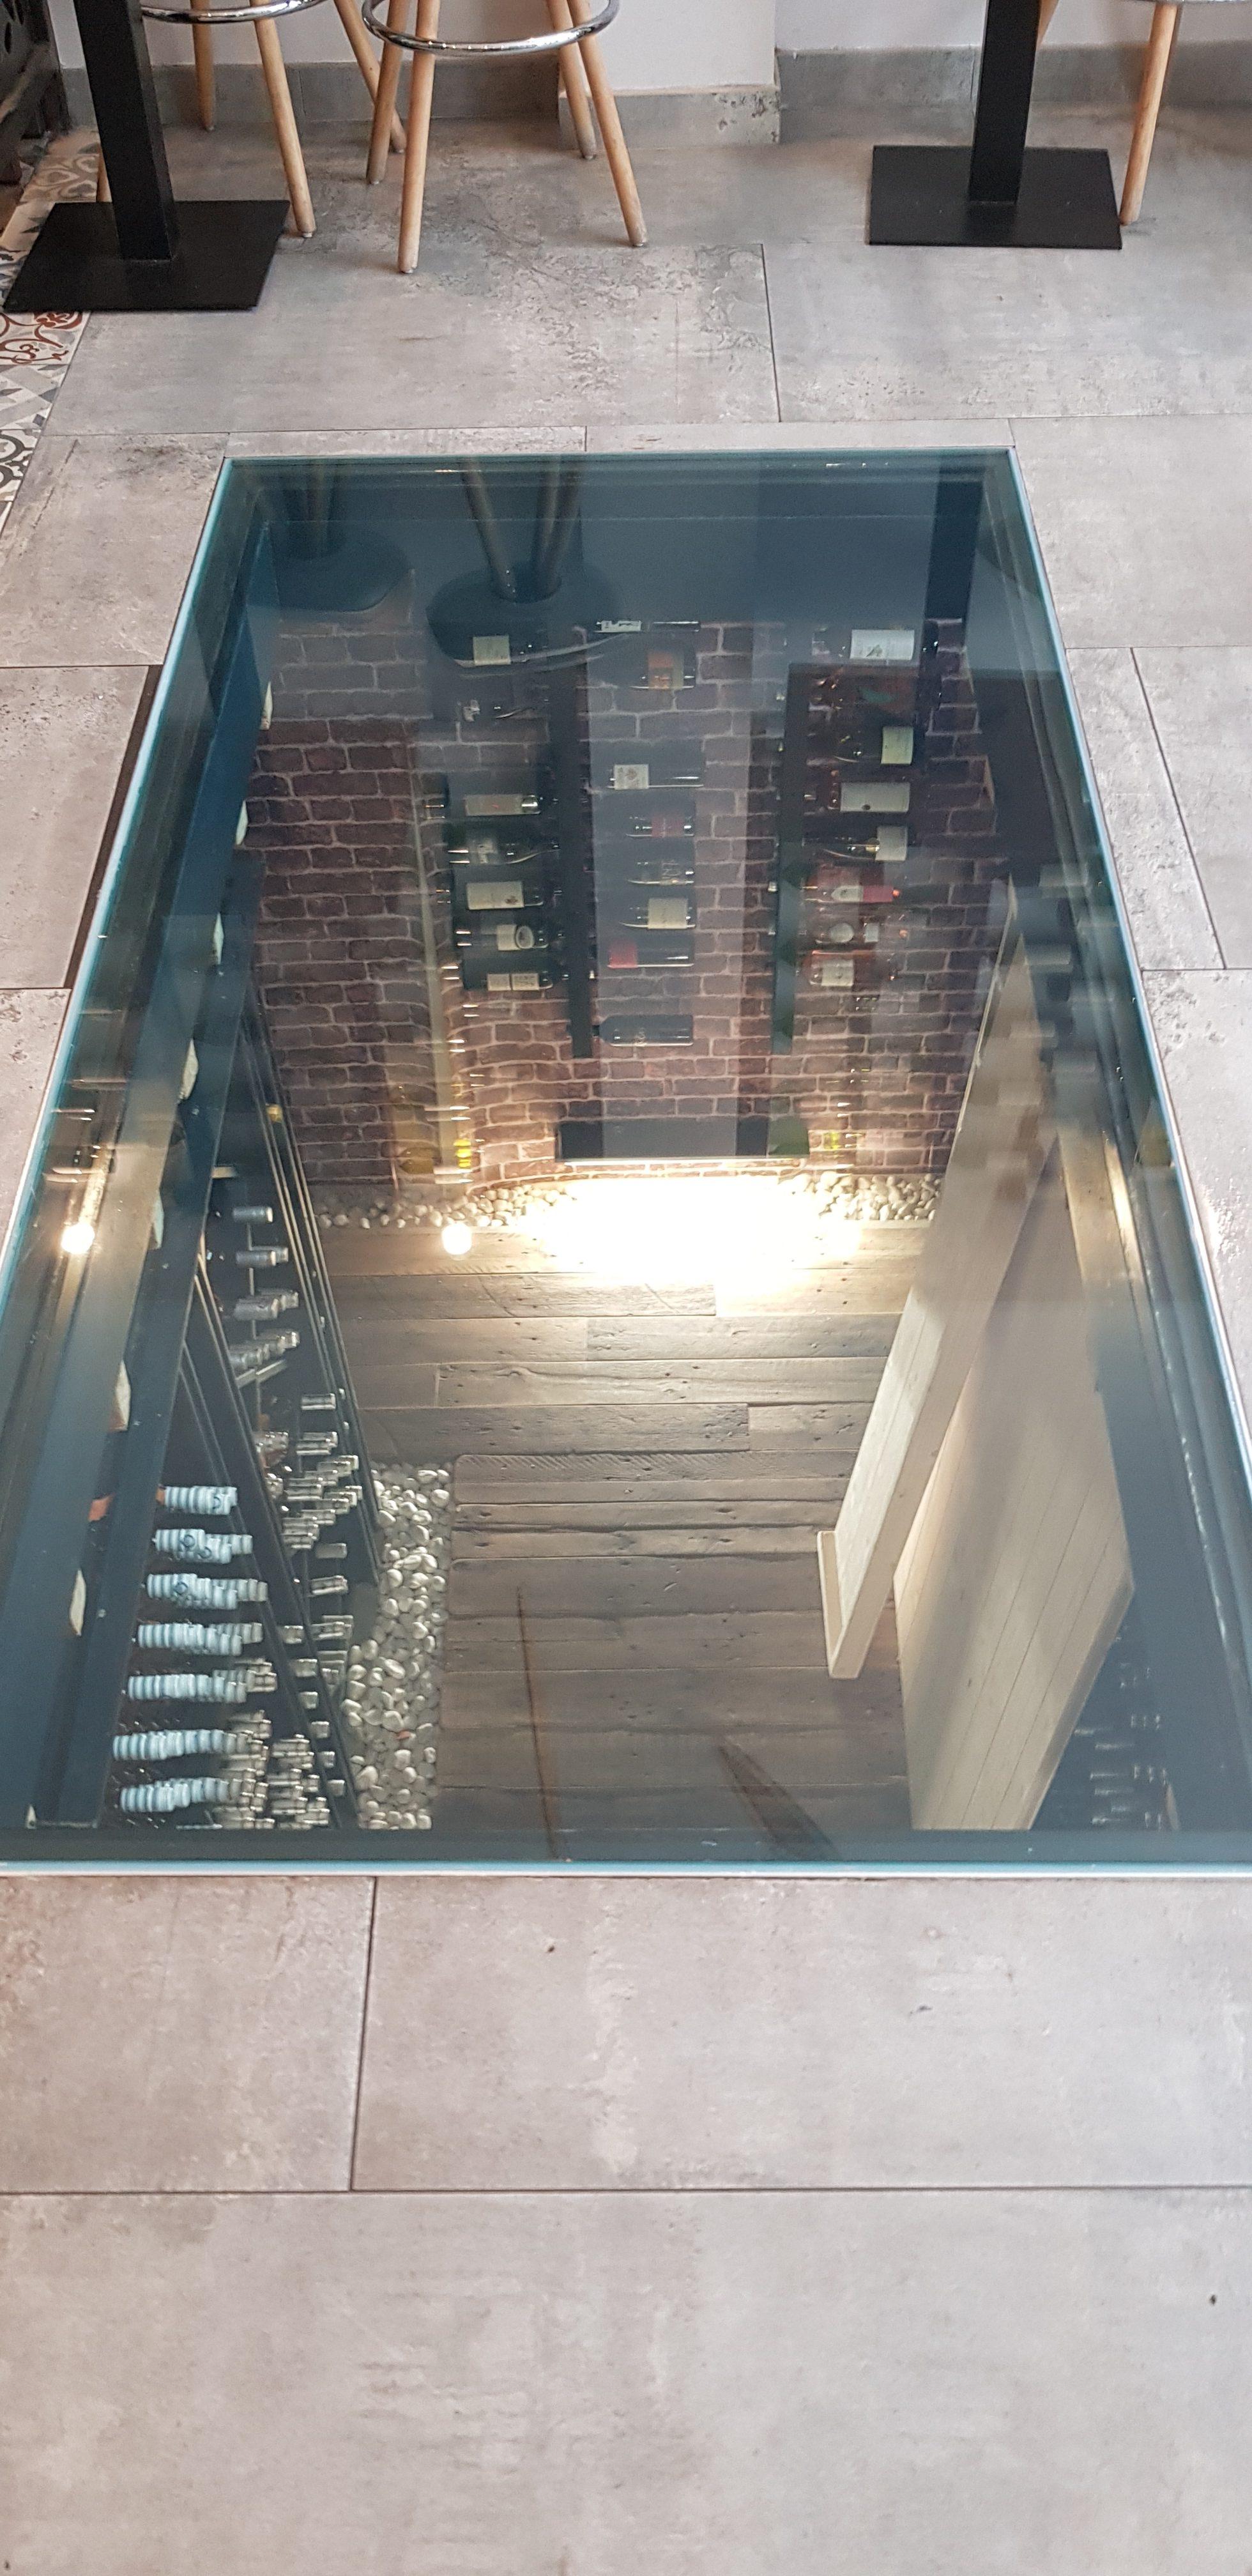 galerie - dalle en verre au sol